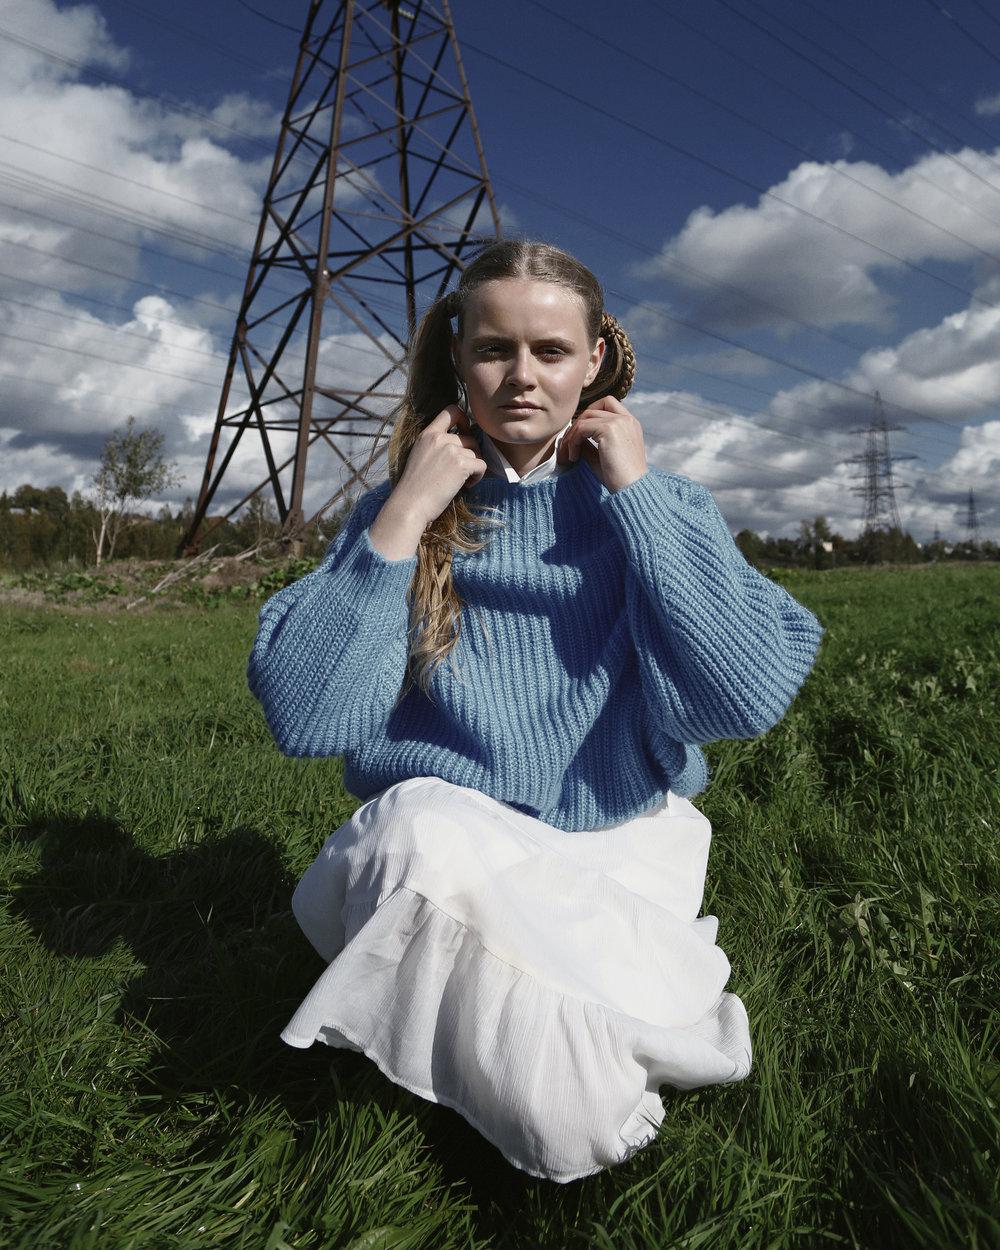 Dress - vintage from @vintage_antresol T-shirt dress - COS Shirt - Max Mara Sweater - Mango Tights - Calzedonia Boots - Dr. Martens